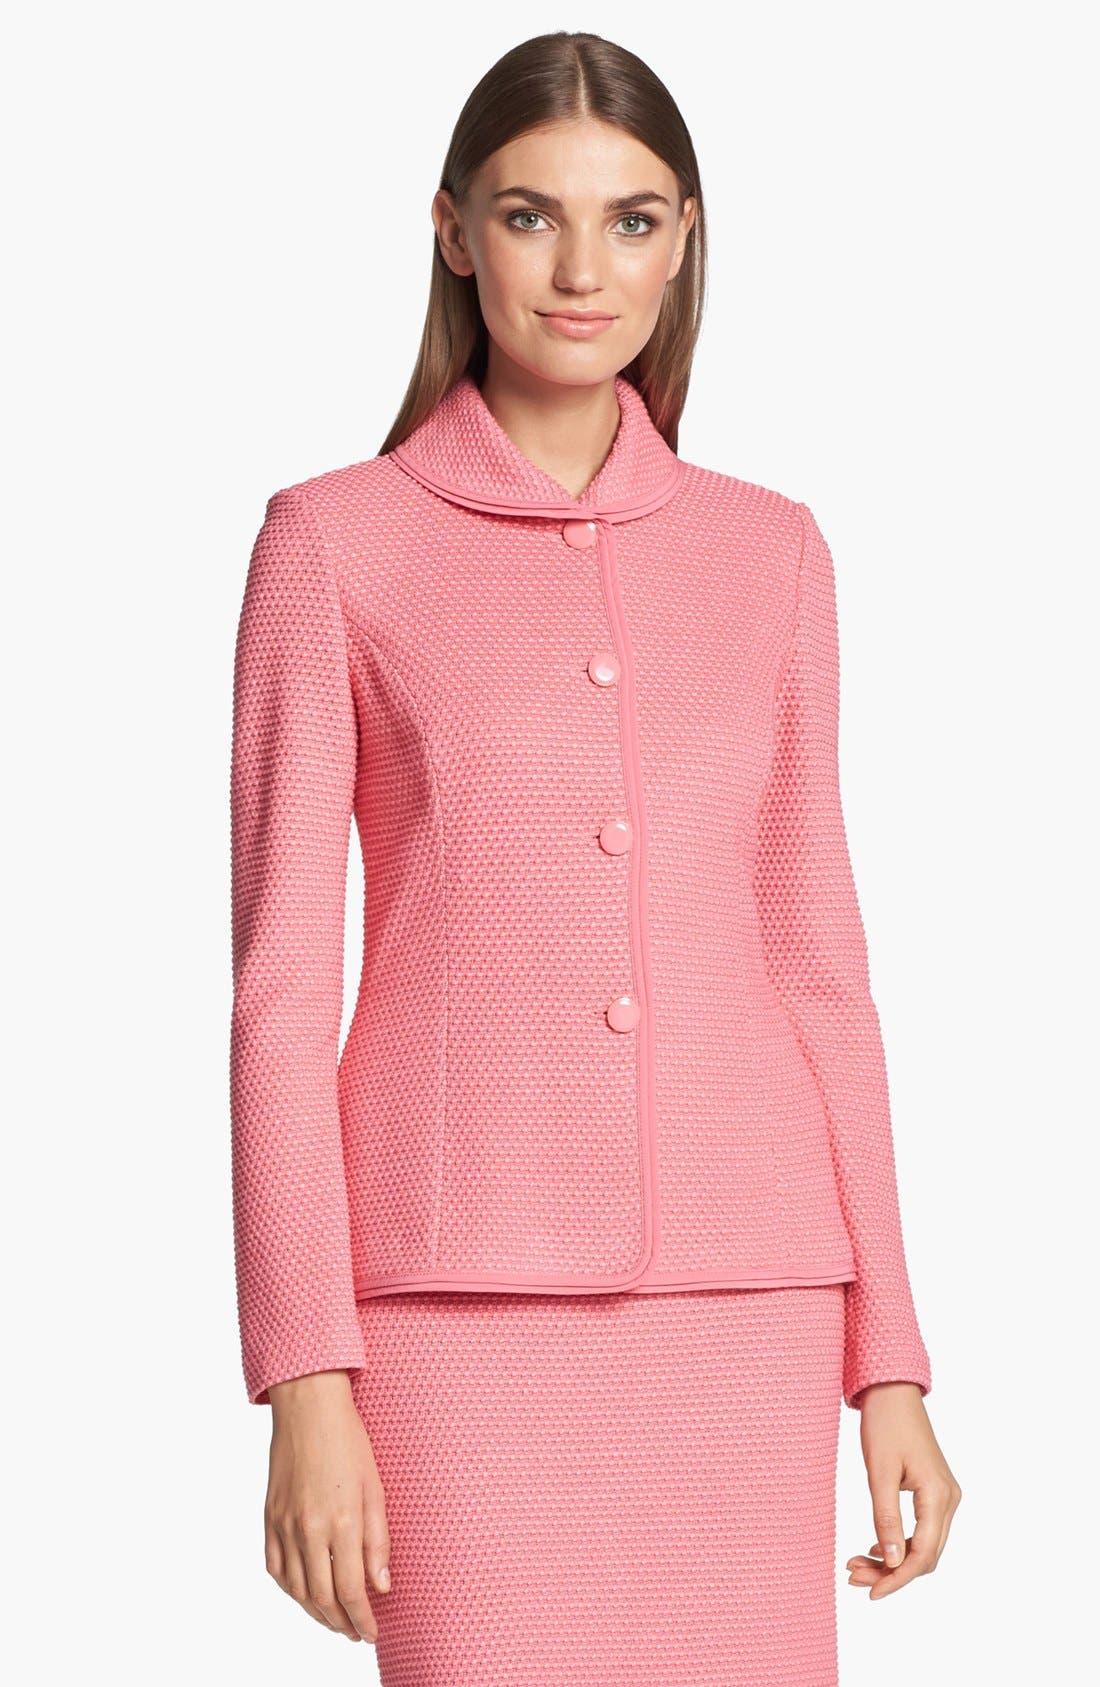 Main Image - St. John Collection Punto Riso Knit Jacket